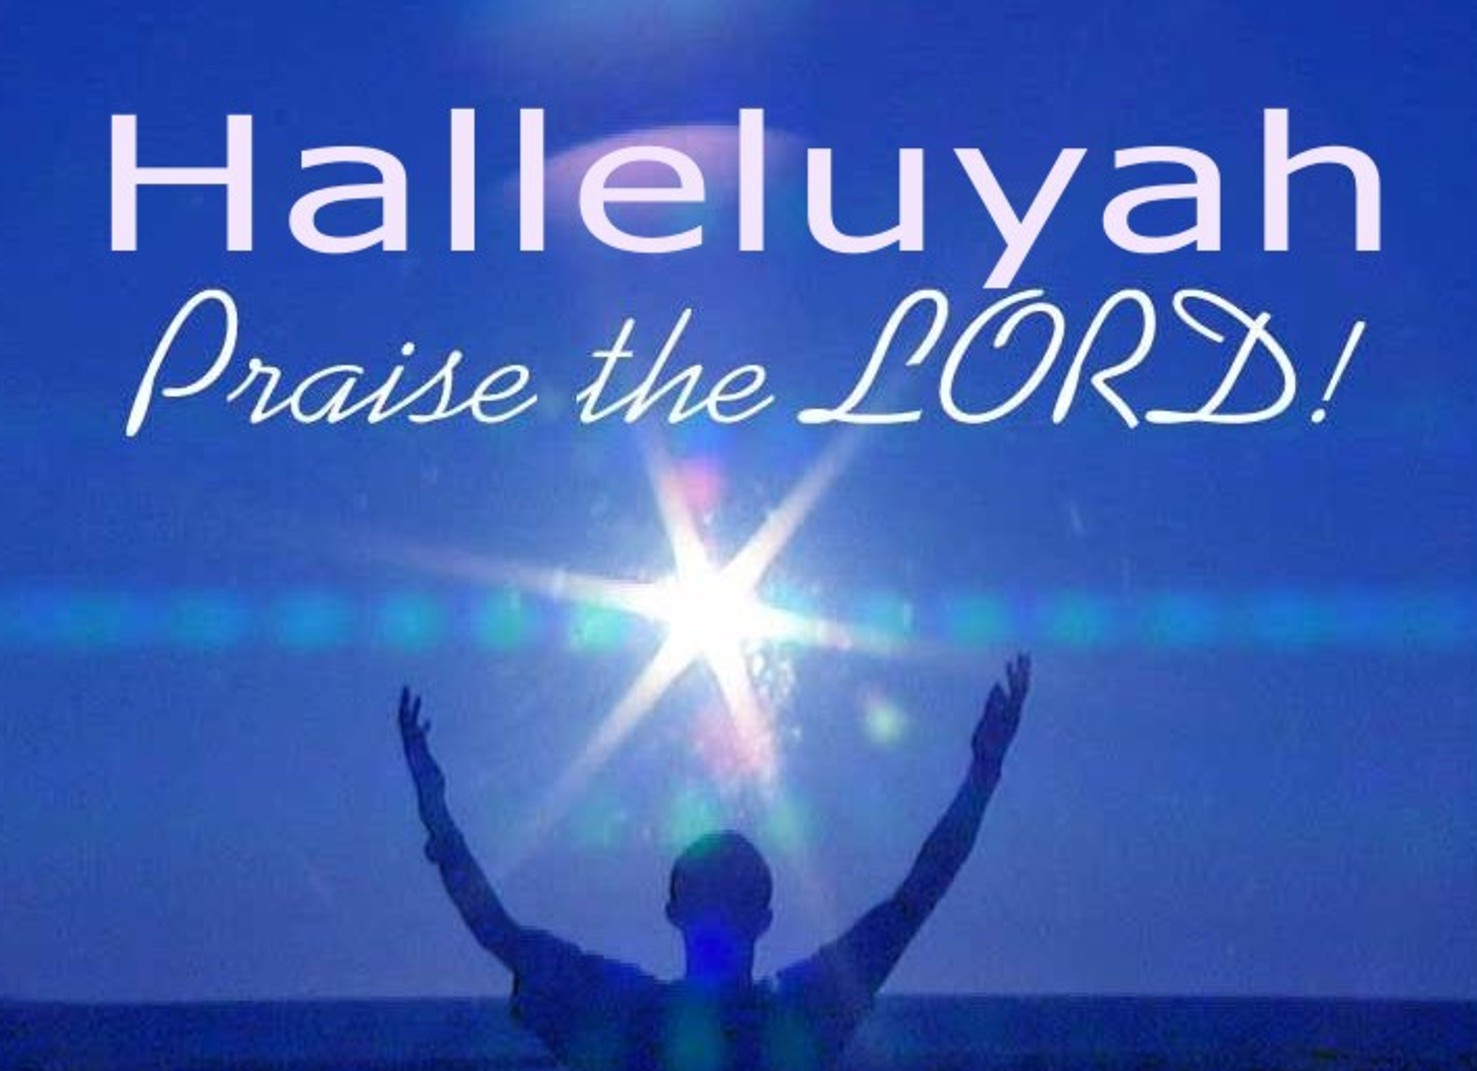 praise_the_lord.jpg